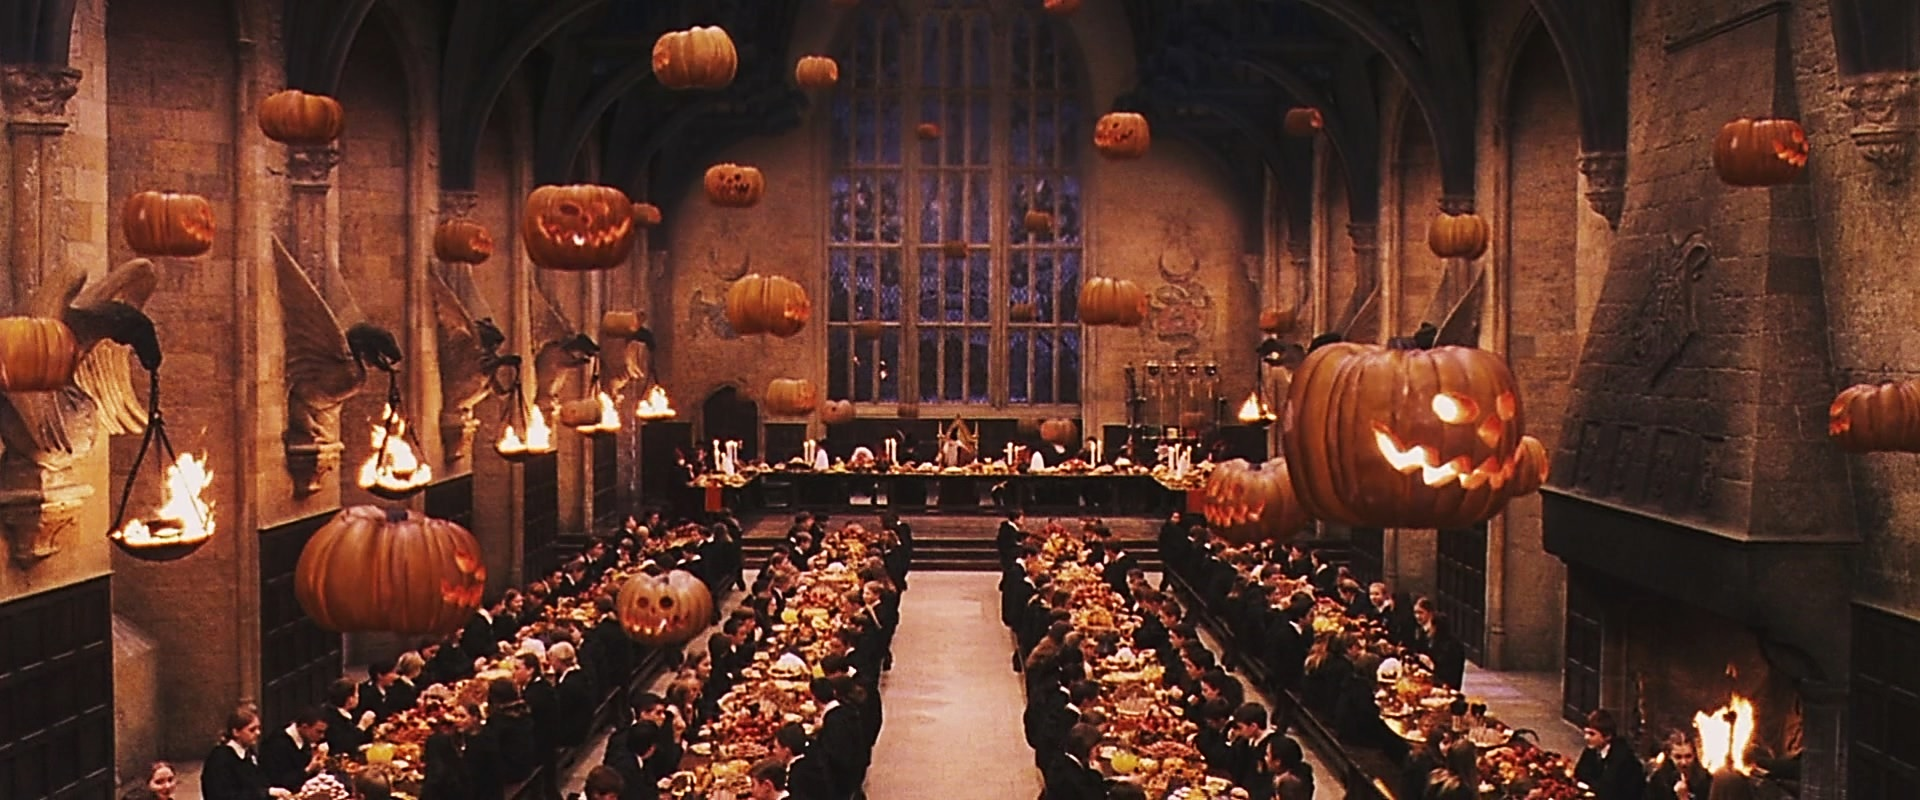 Risultati immagini per halloween hogwarts